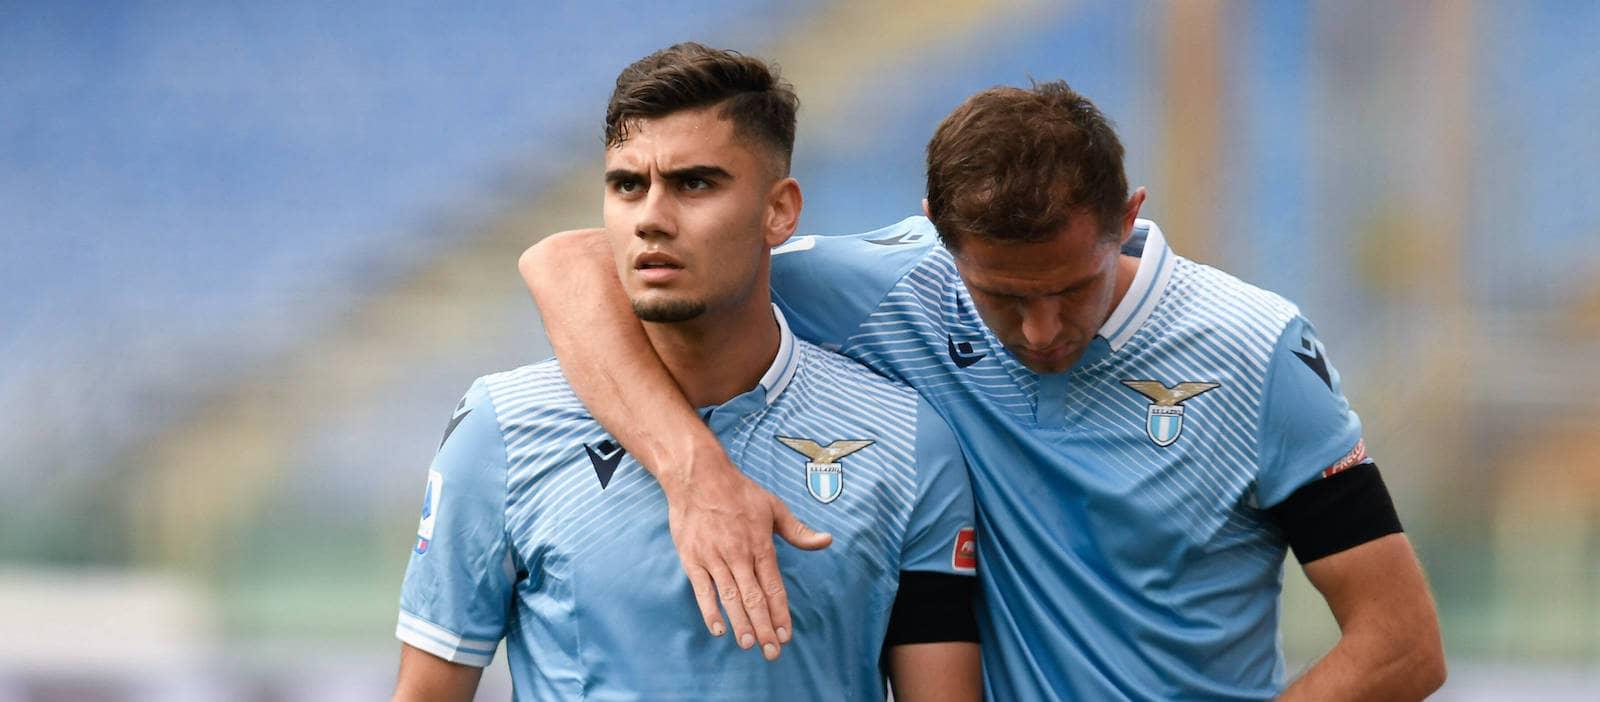 Maurizio Sarri wants Andreas Pereira to remain at Lazio next season - Man  United News & Transfer News | The Peoples Person